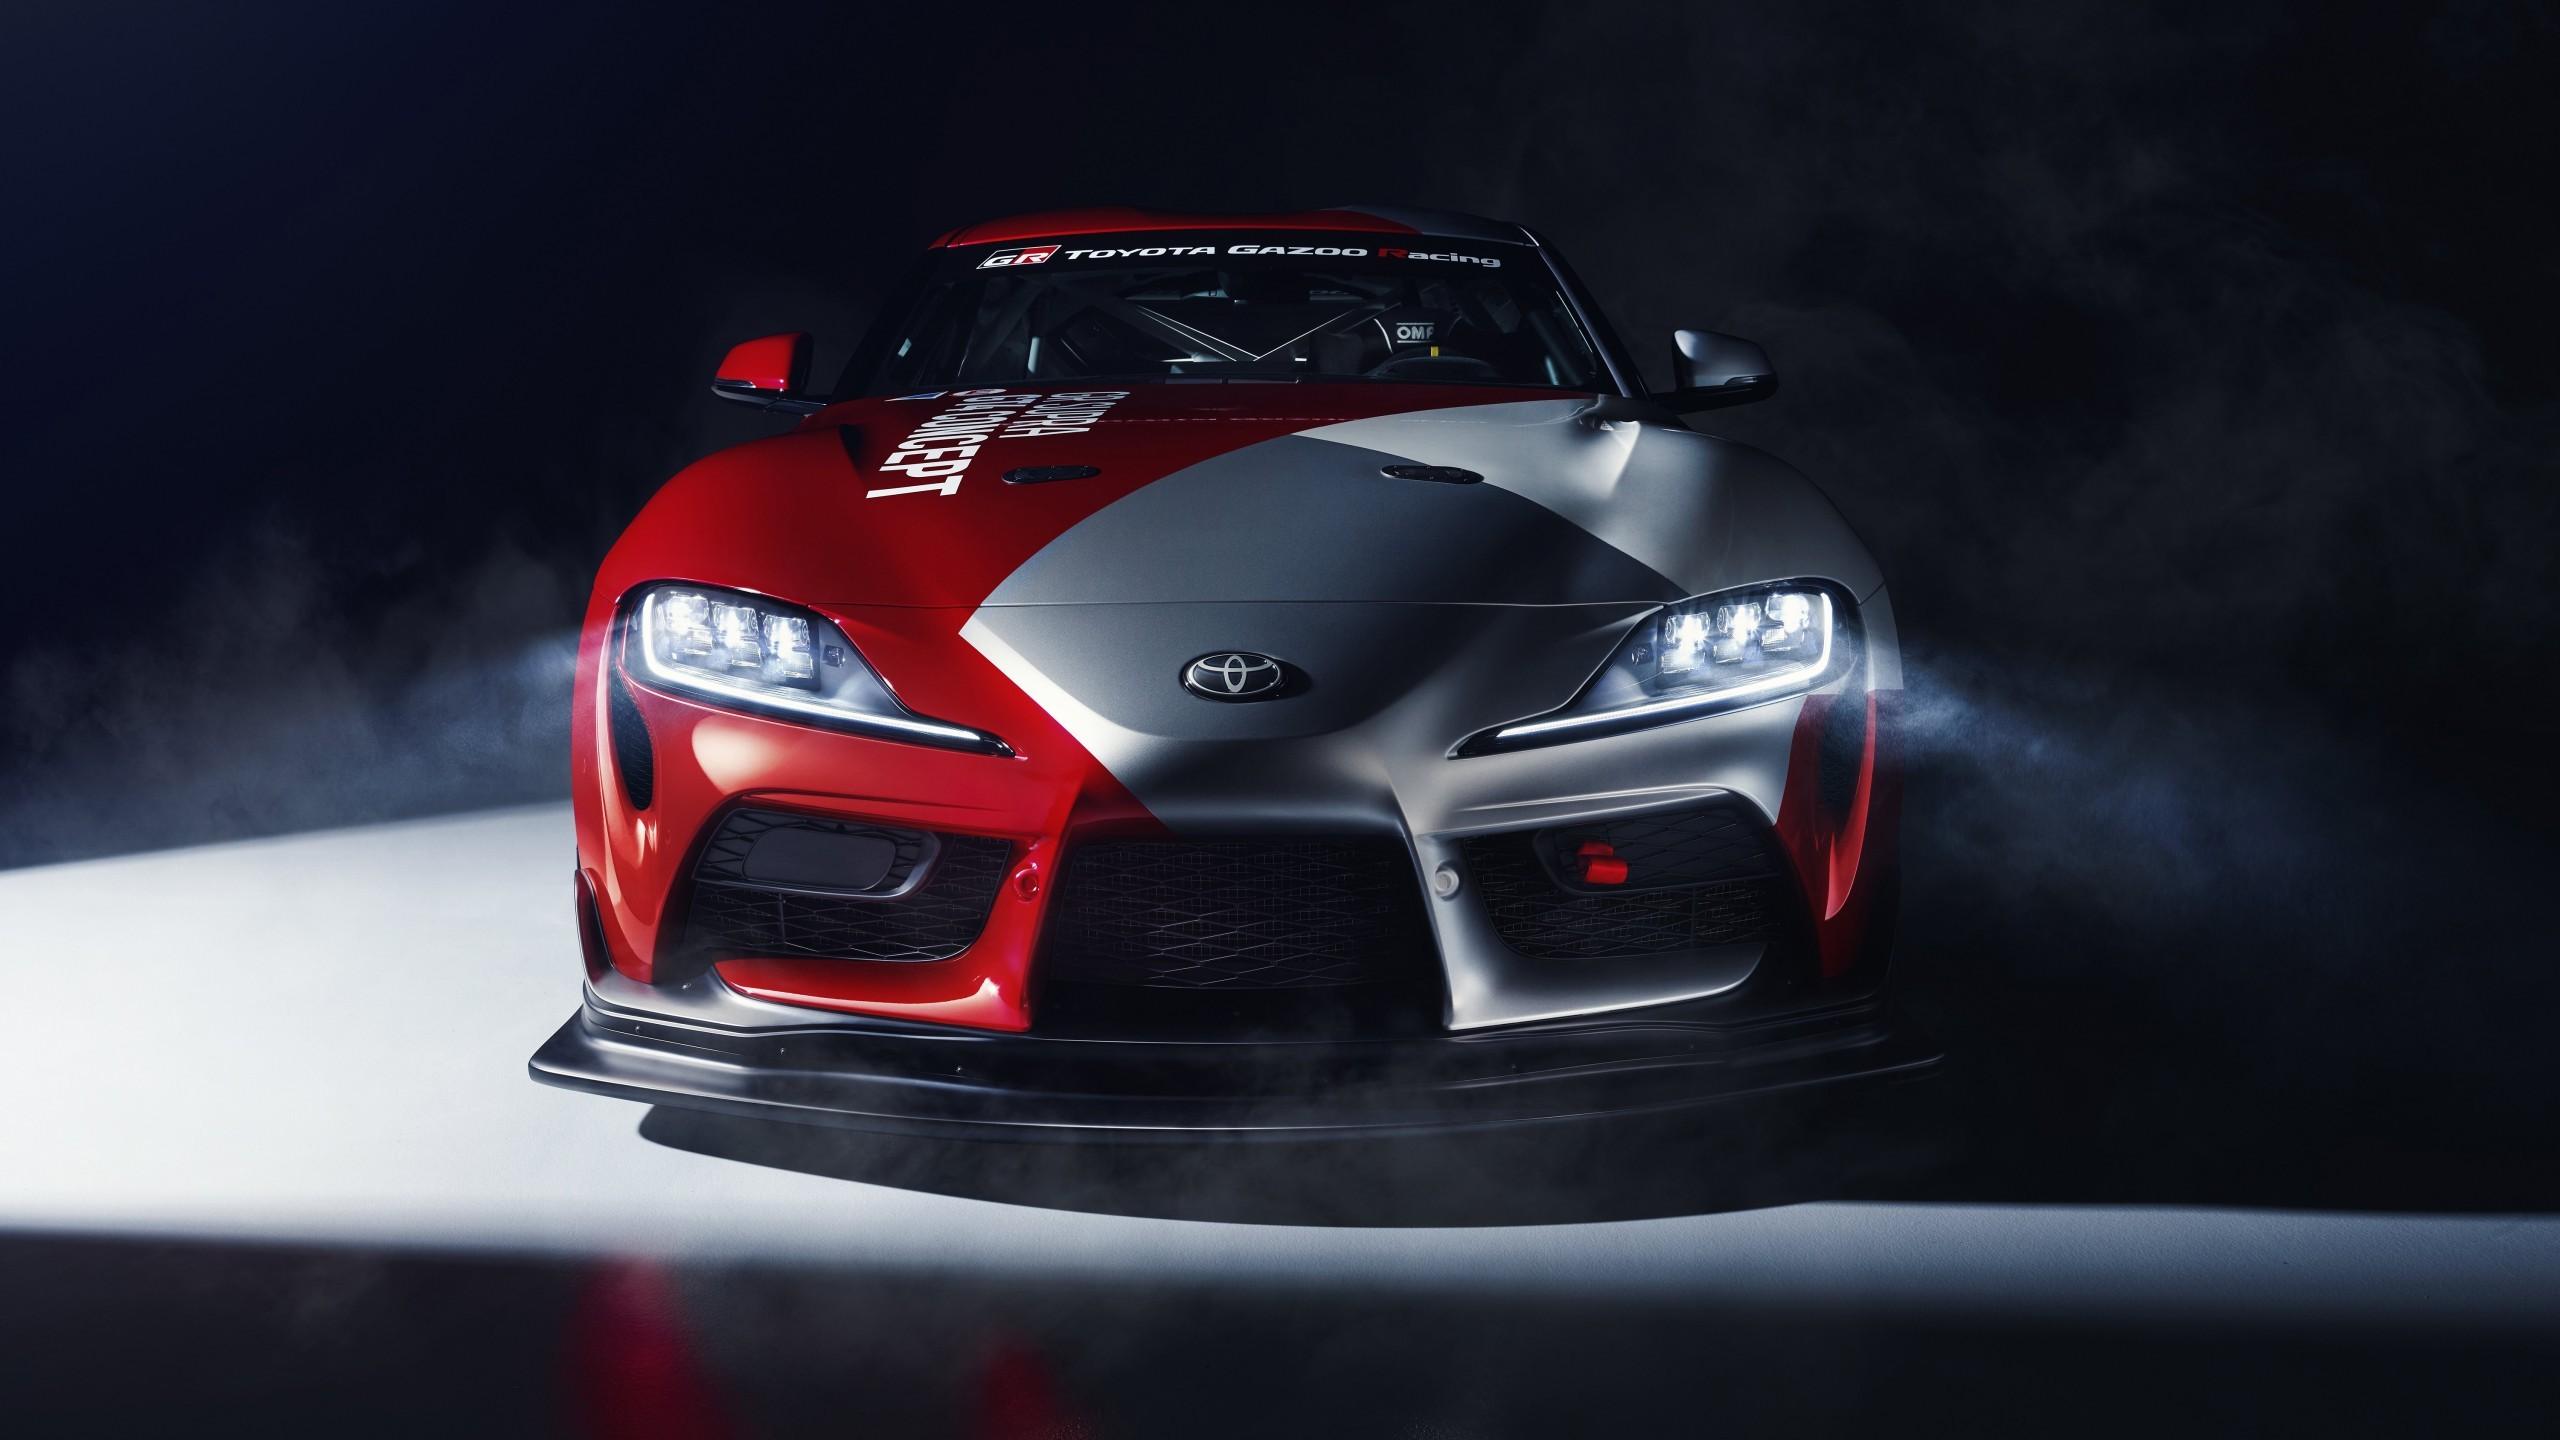 Download 2560x1440 Toyota Gr Supra Gt4 Racing Cars Concept 2560x1440